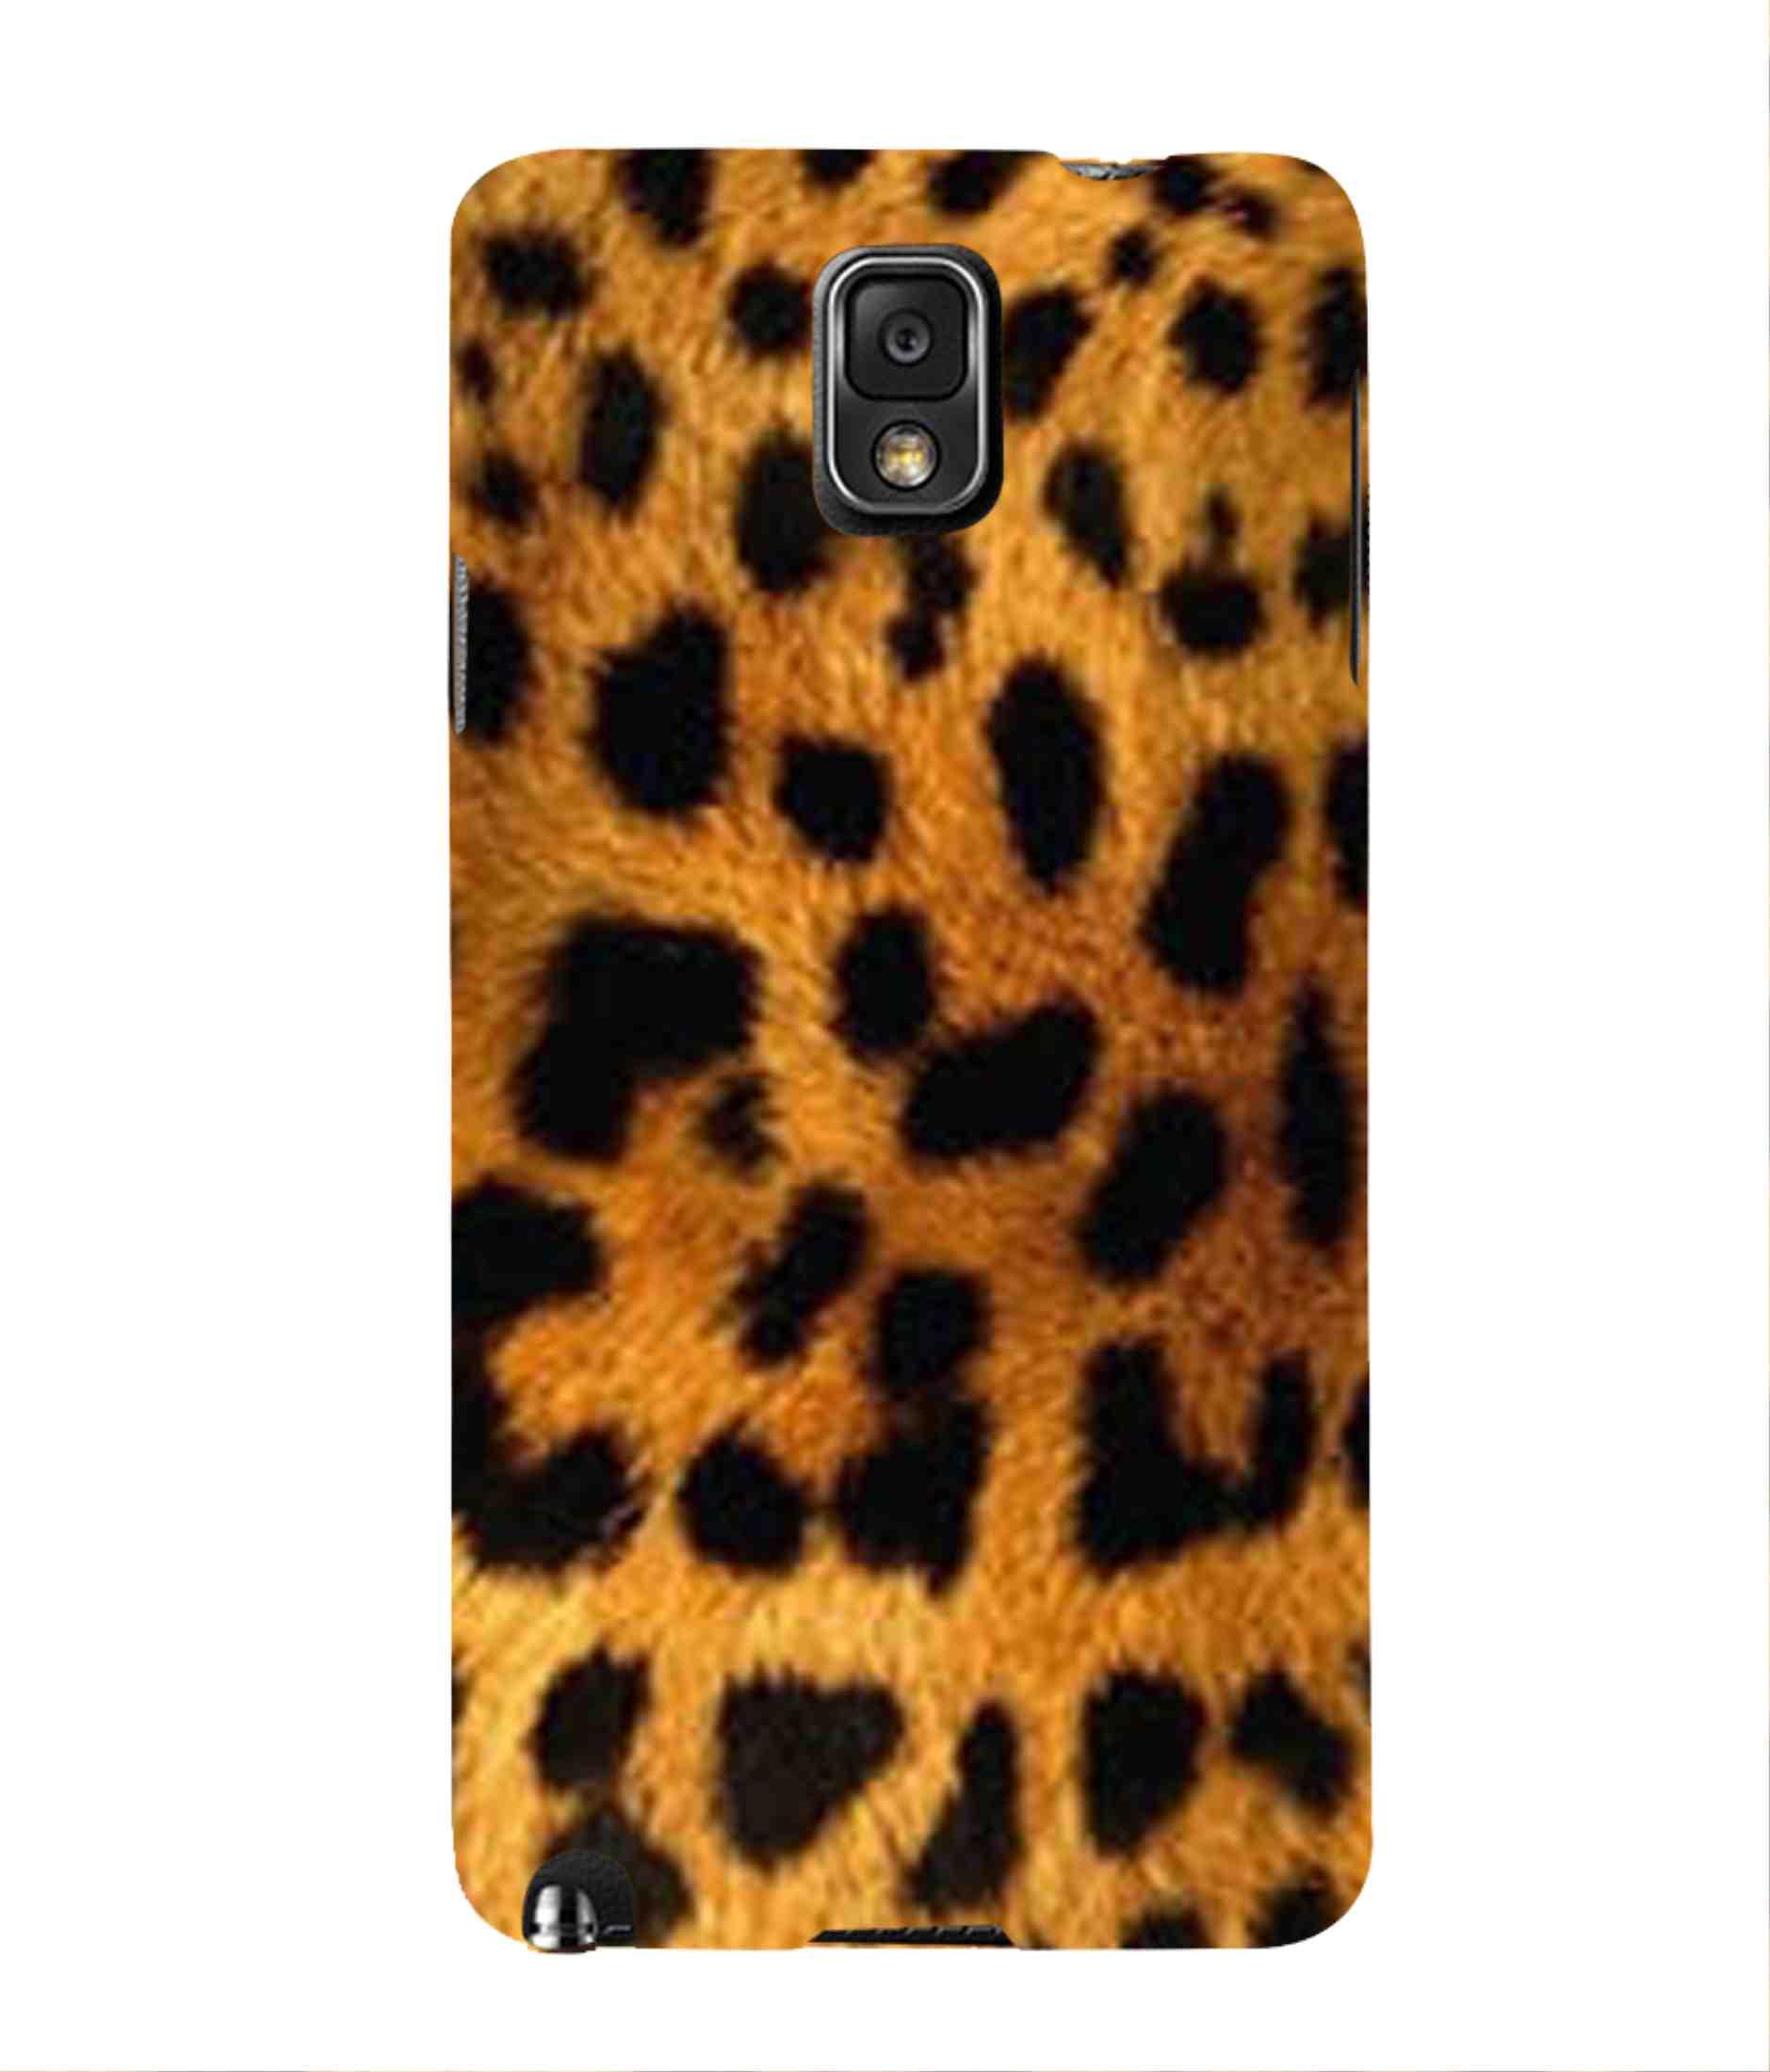 Vibrante Mobile Case Cover For Samsung Galaxy Note 3 , Samsung Galaxy Note Iii , Samsung Galaxy Note 3 N9002 , Samsung Galaxy Note N9000 N9005 28869